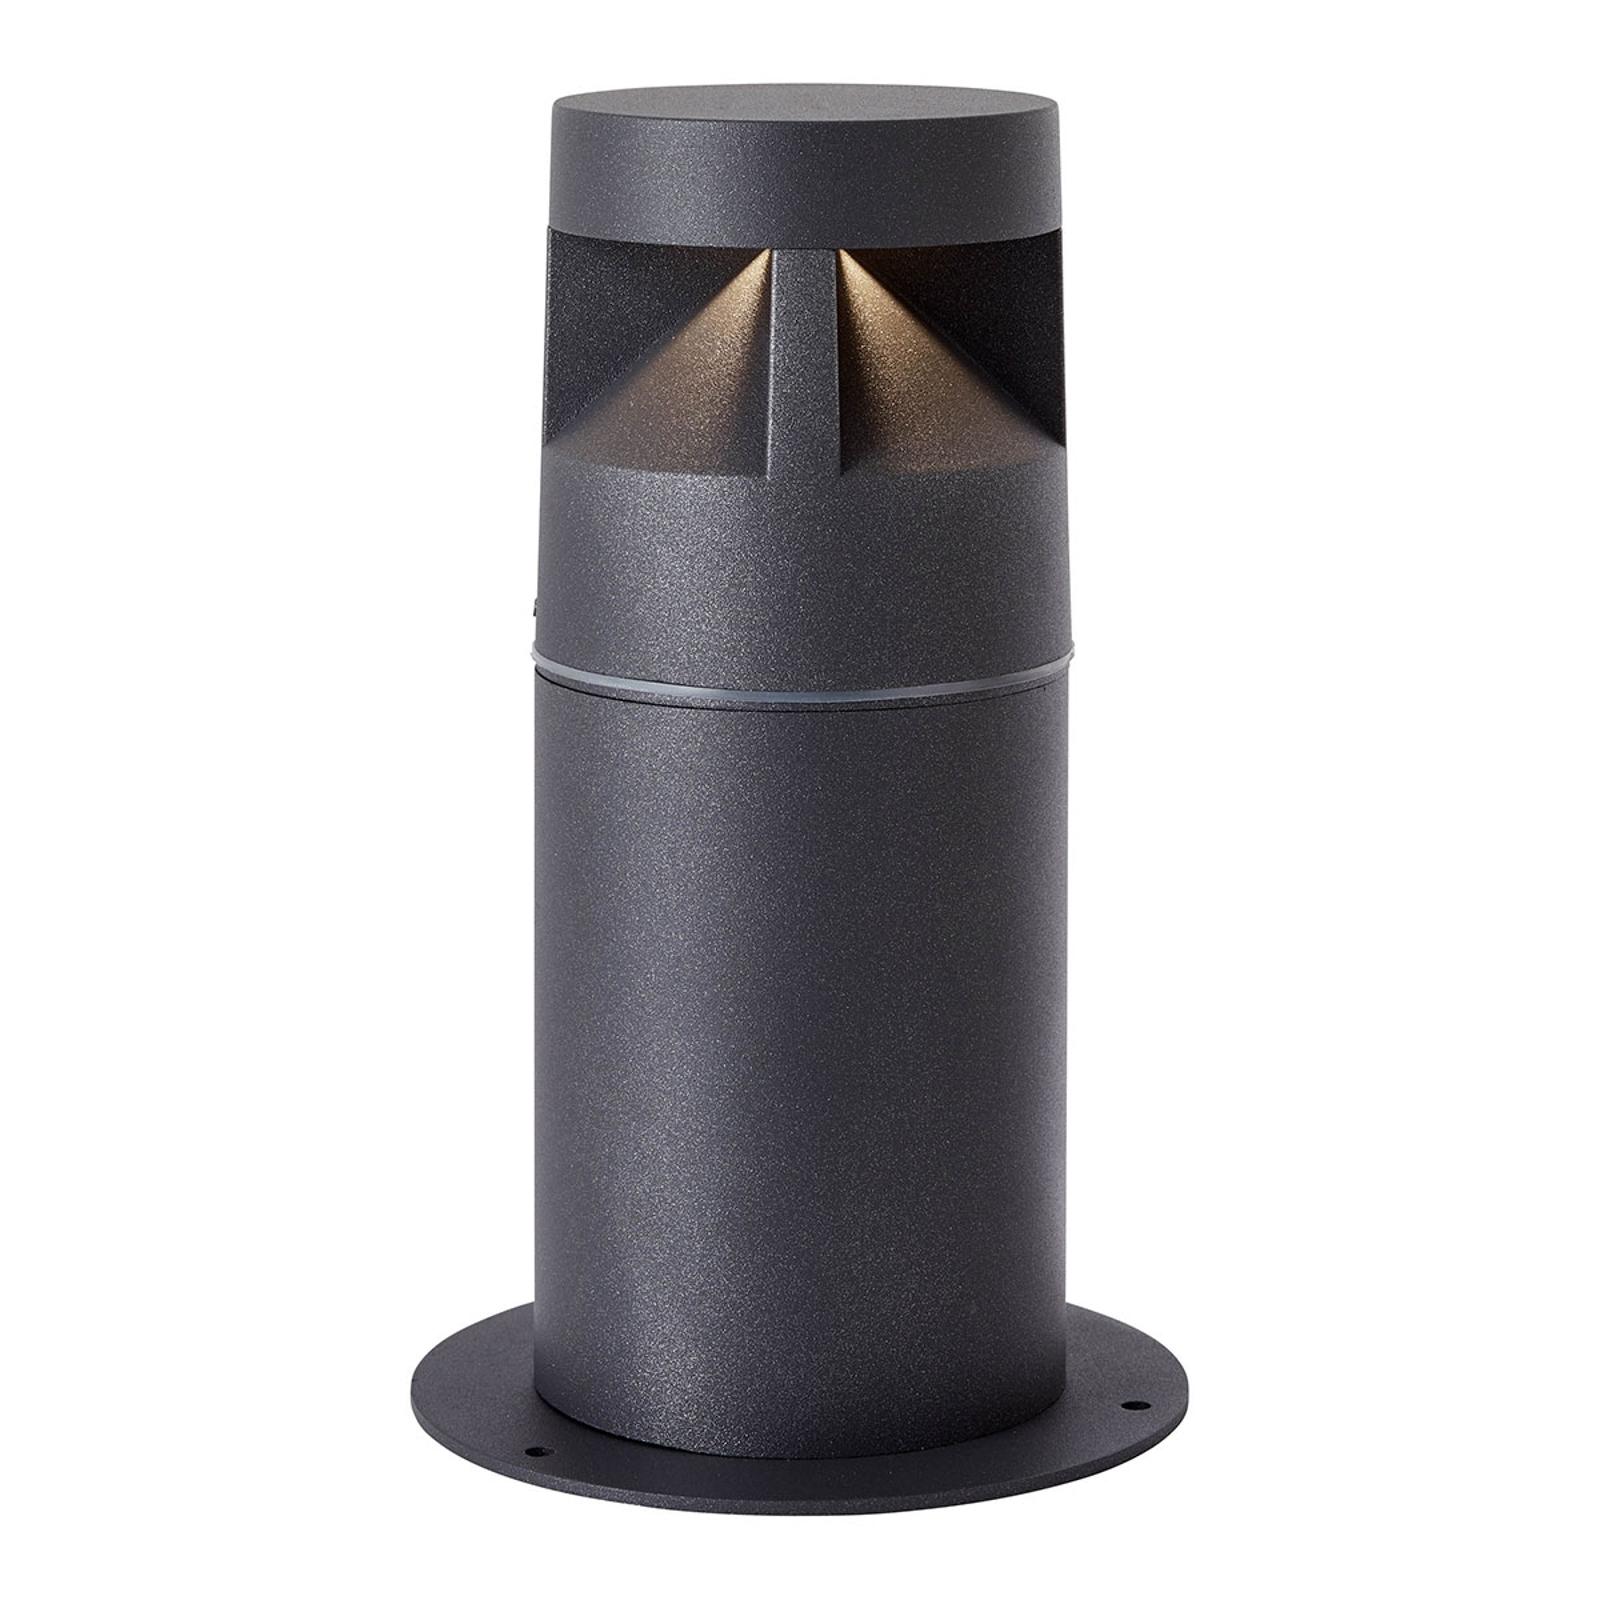 AEG Winslow lampioncino LED altezza 26 cm